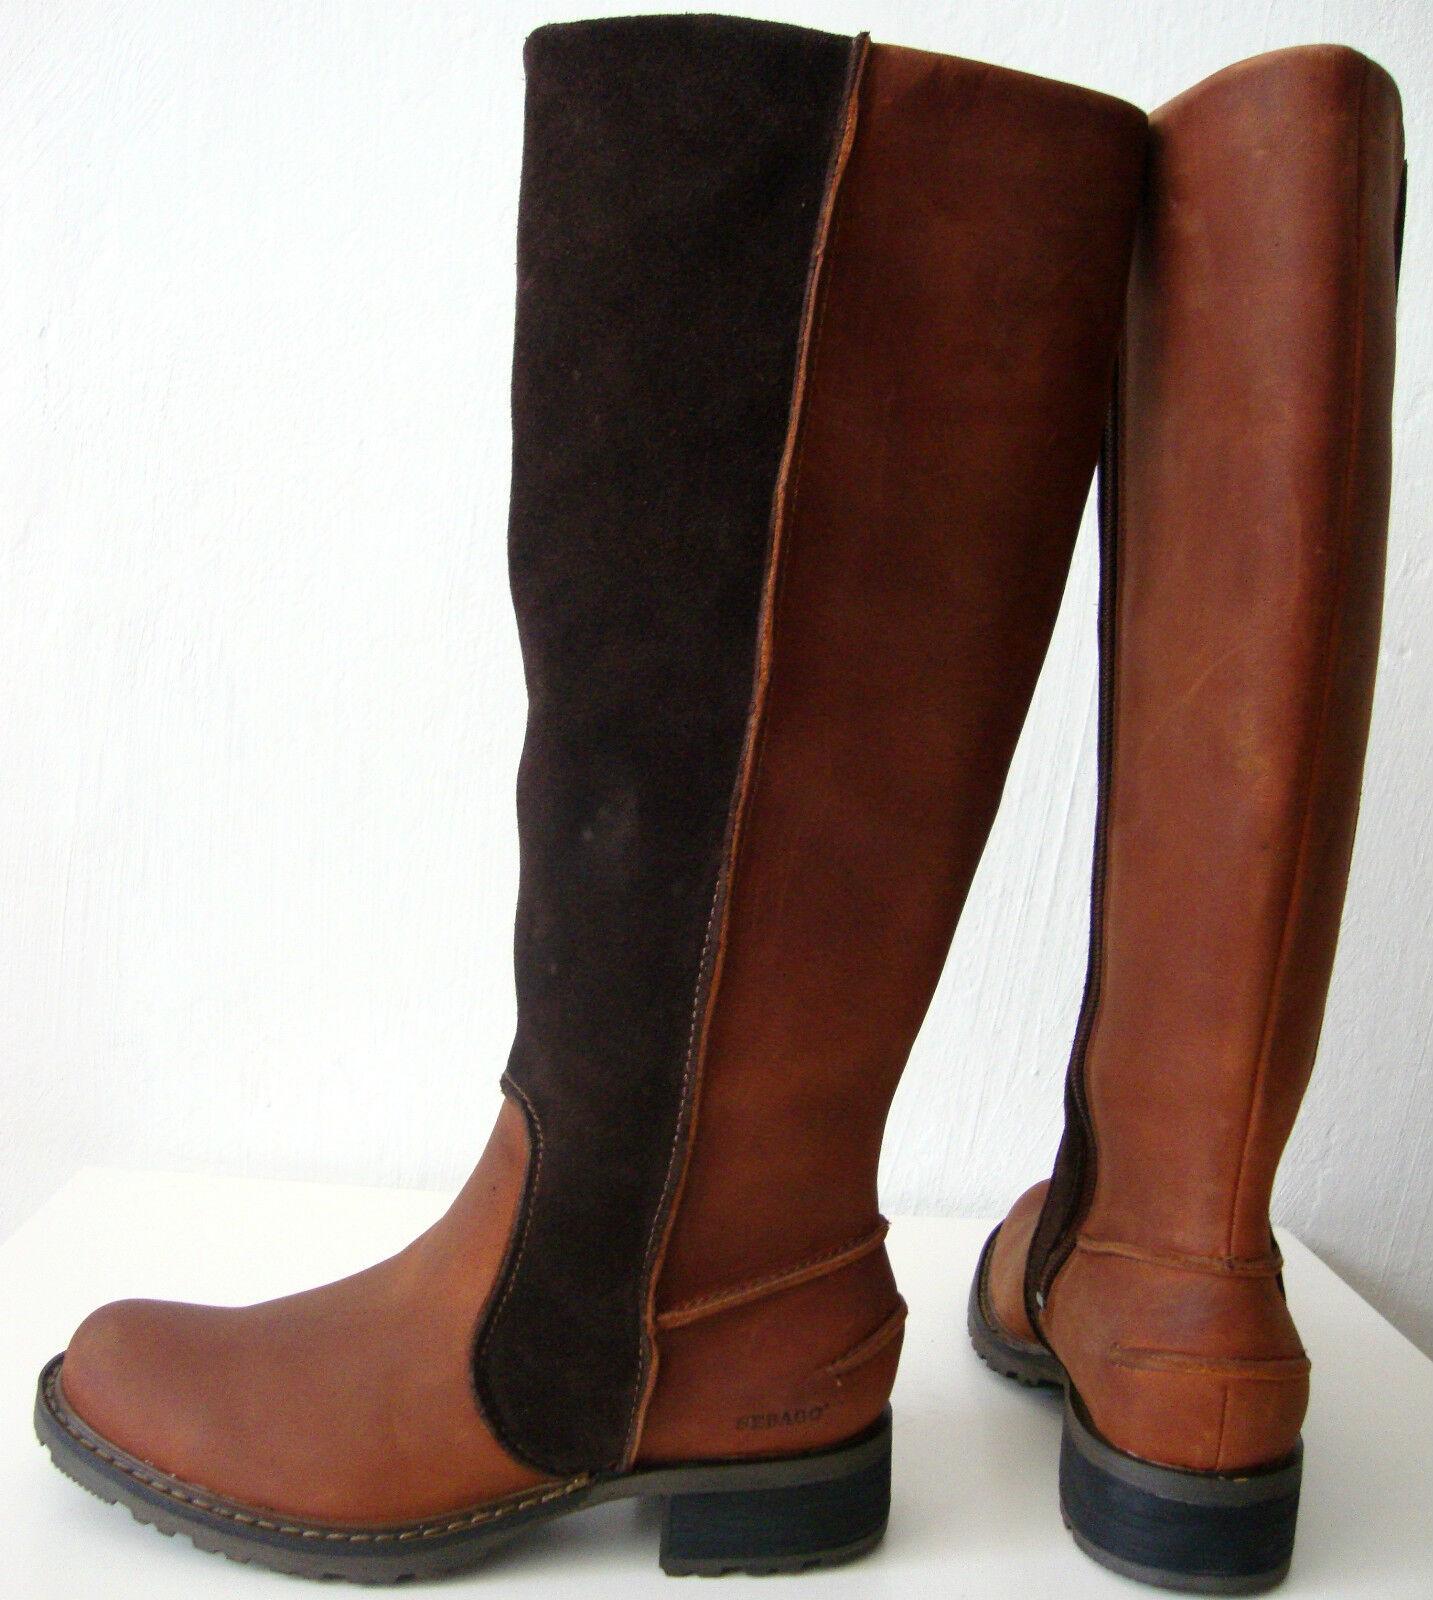 SEBBGO SBRBNBC TBLL Damen Stiefel Leder Boots Wadenhohe Stiefel Gr.35 NEU